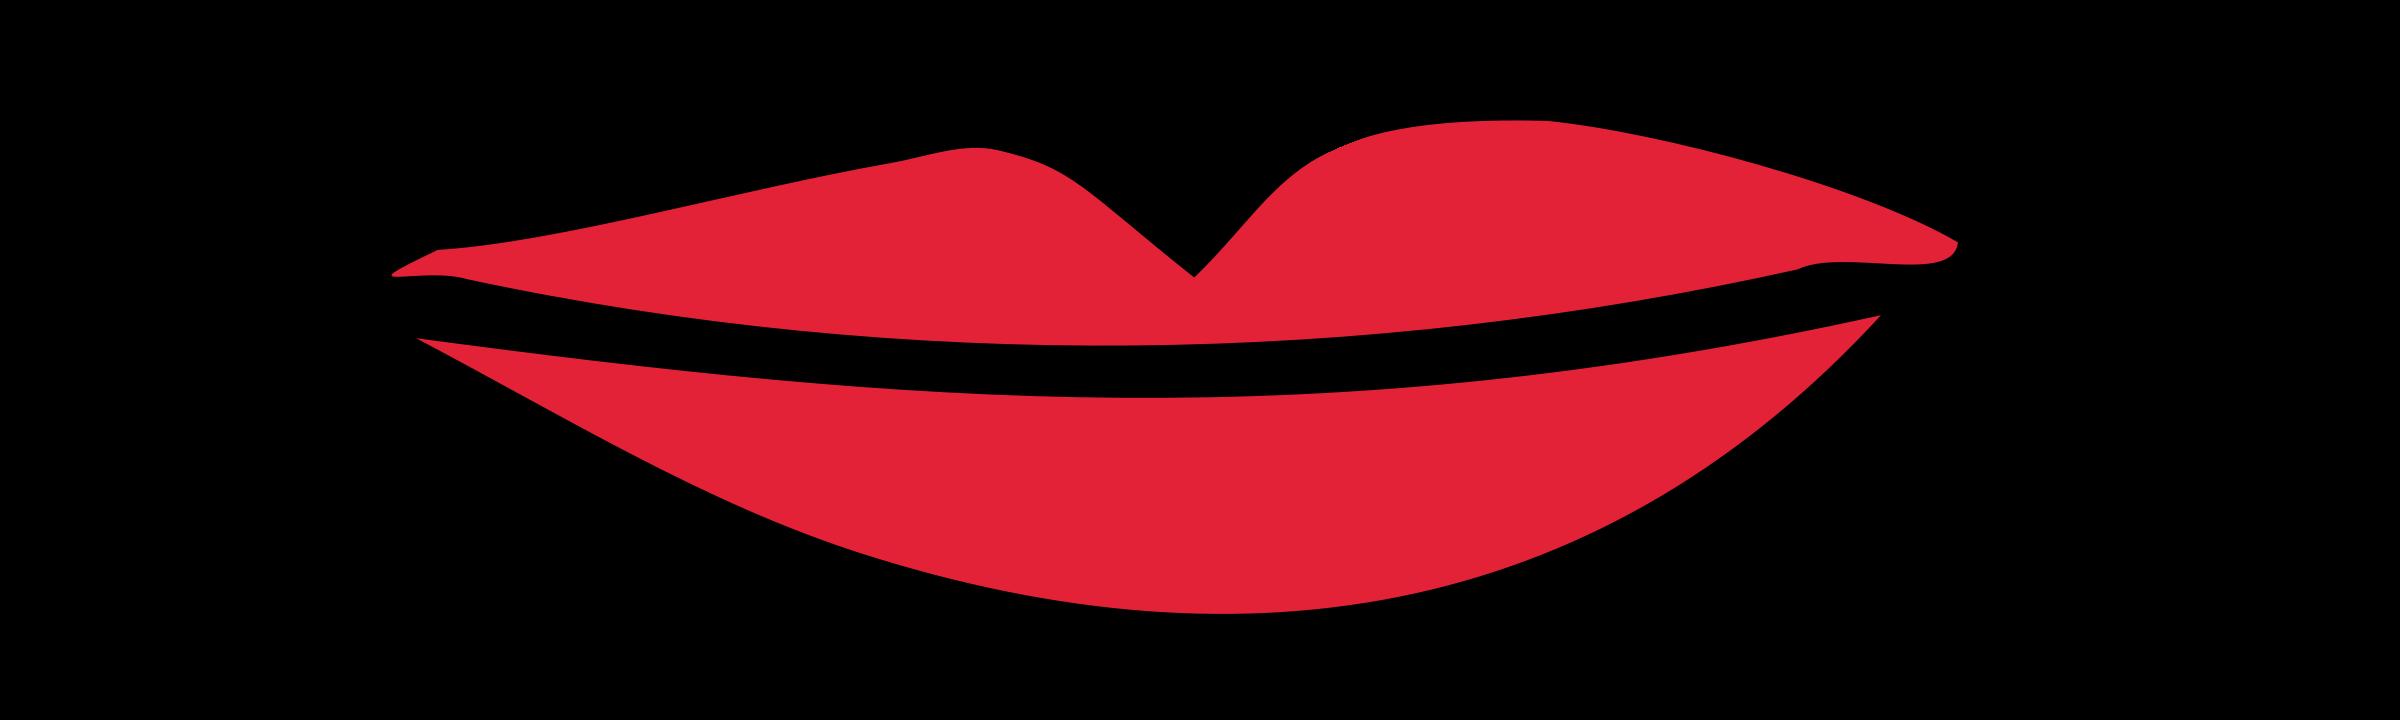 Clip Art Lip Clip Art smile lips clipart panda free images